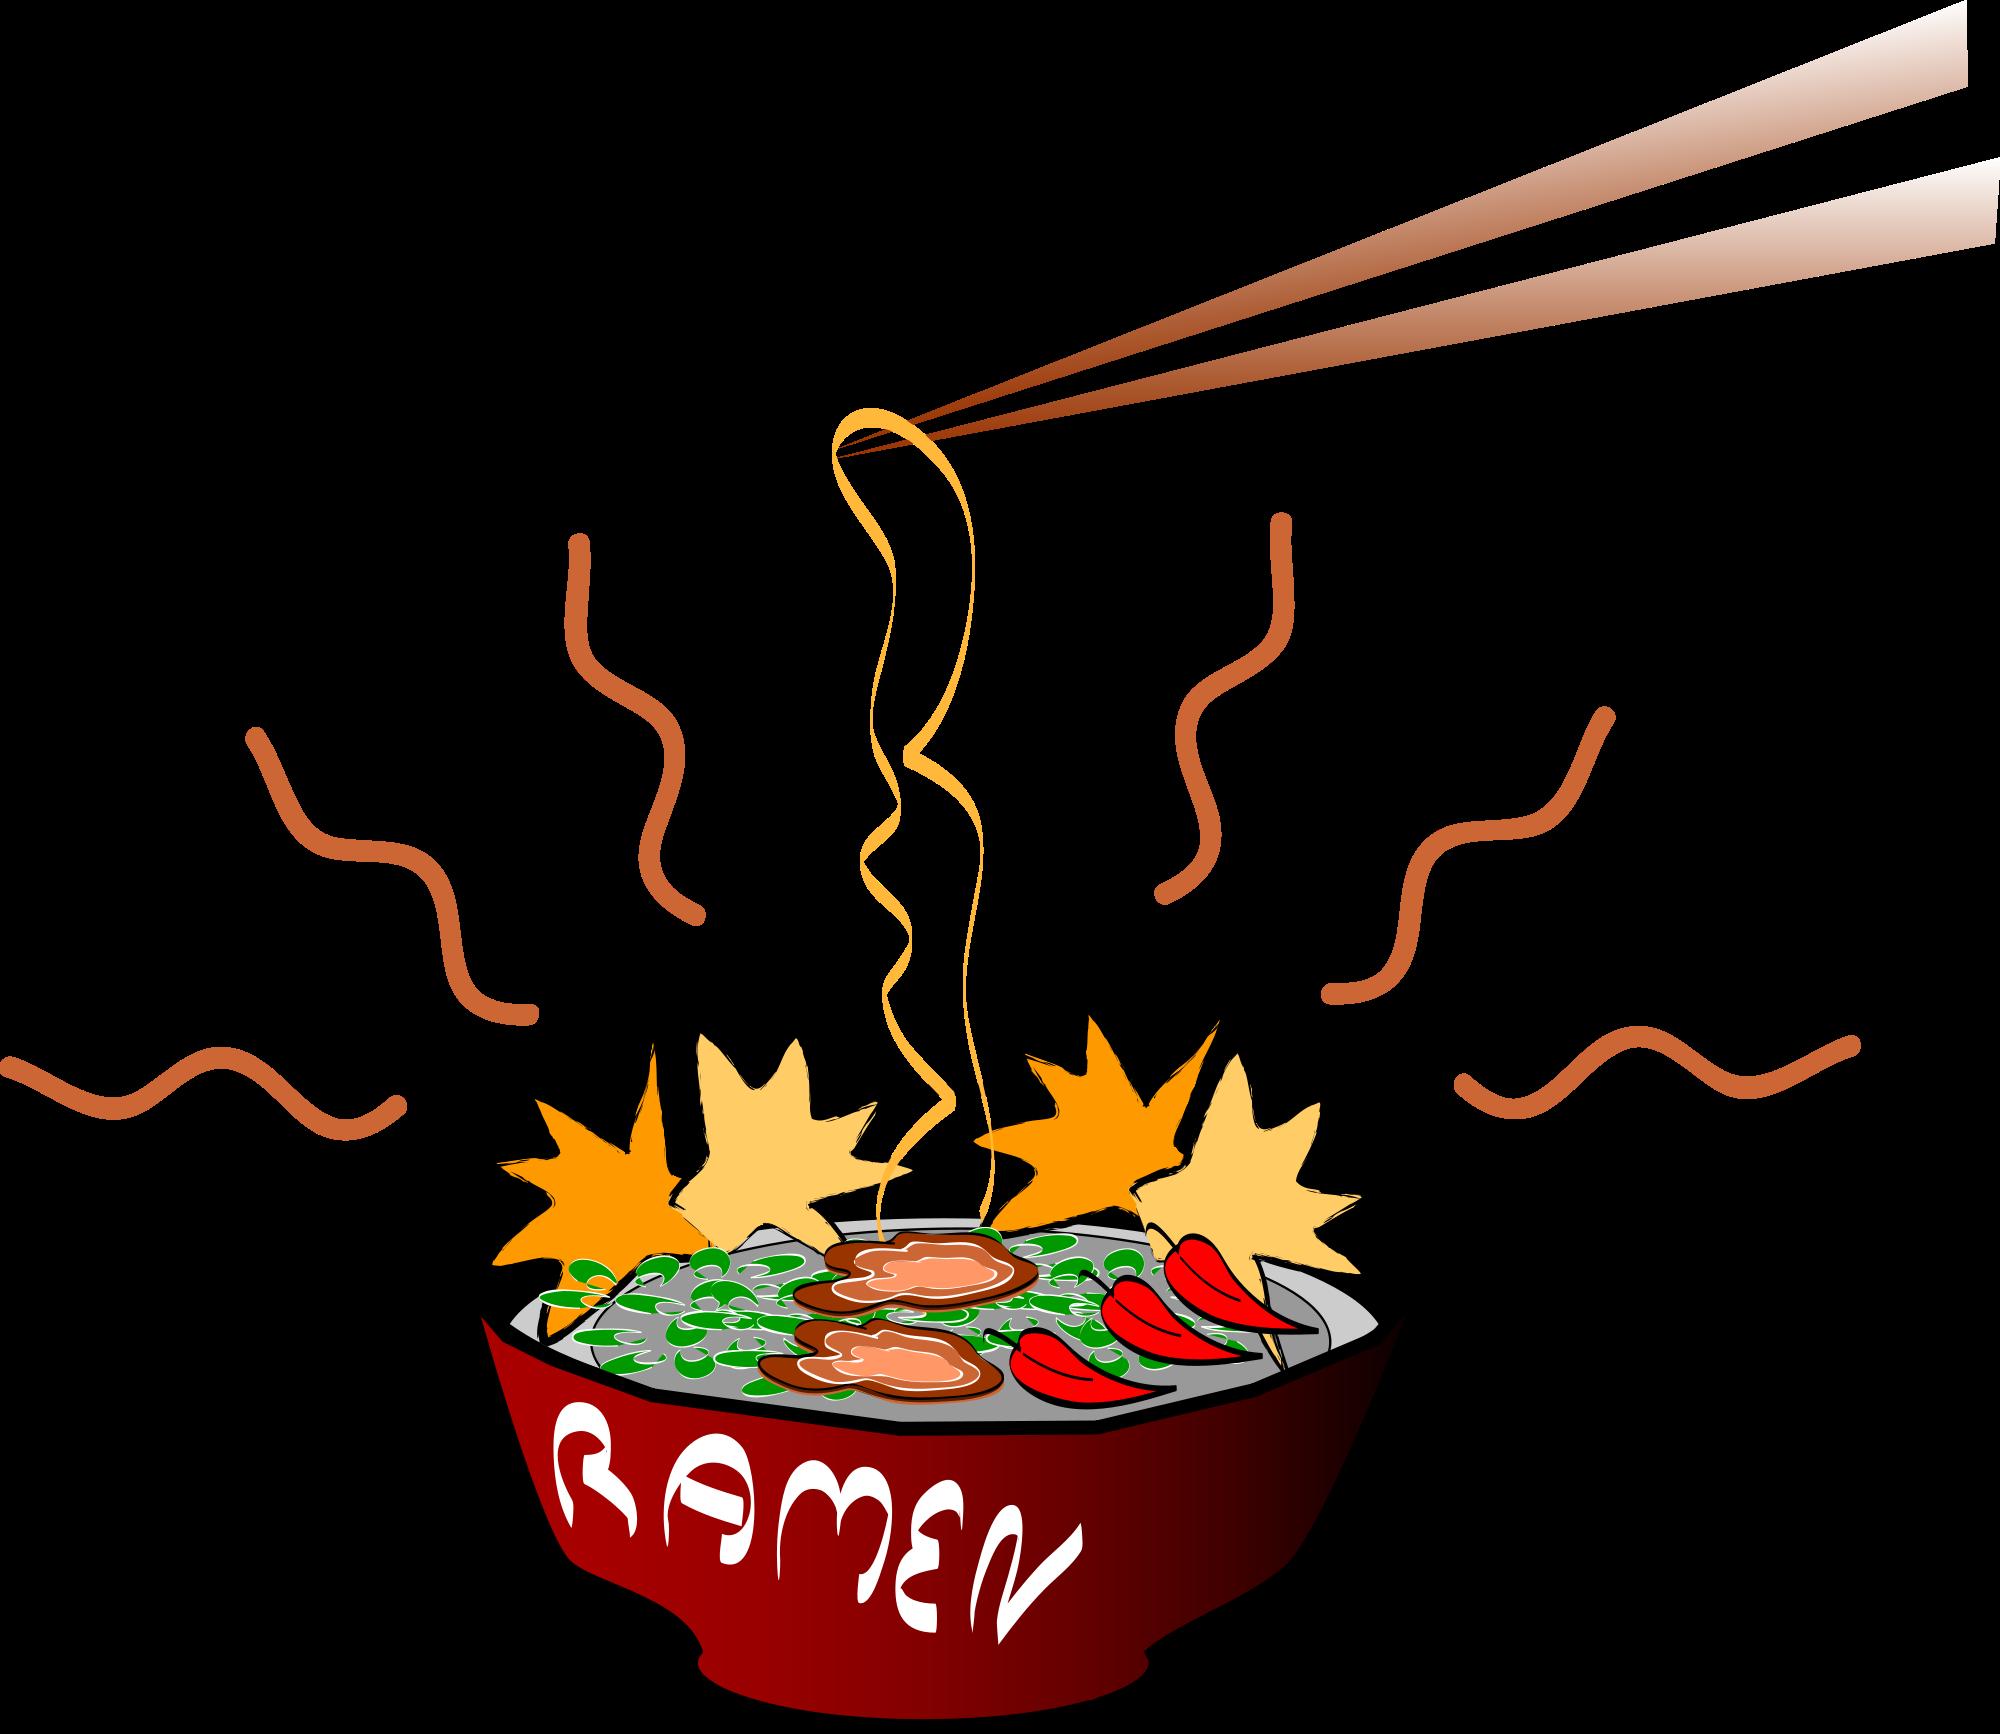 Noodle clipart svg. File ramen wikimedia commons